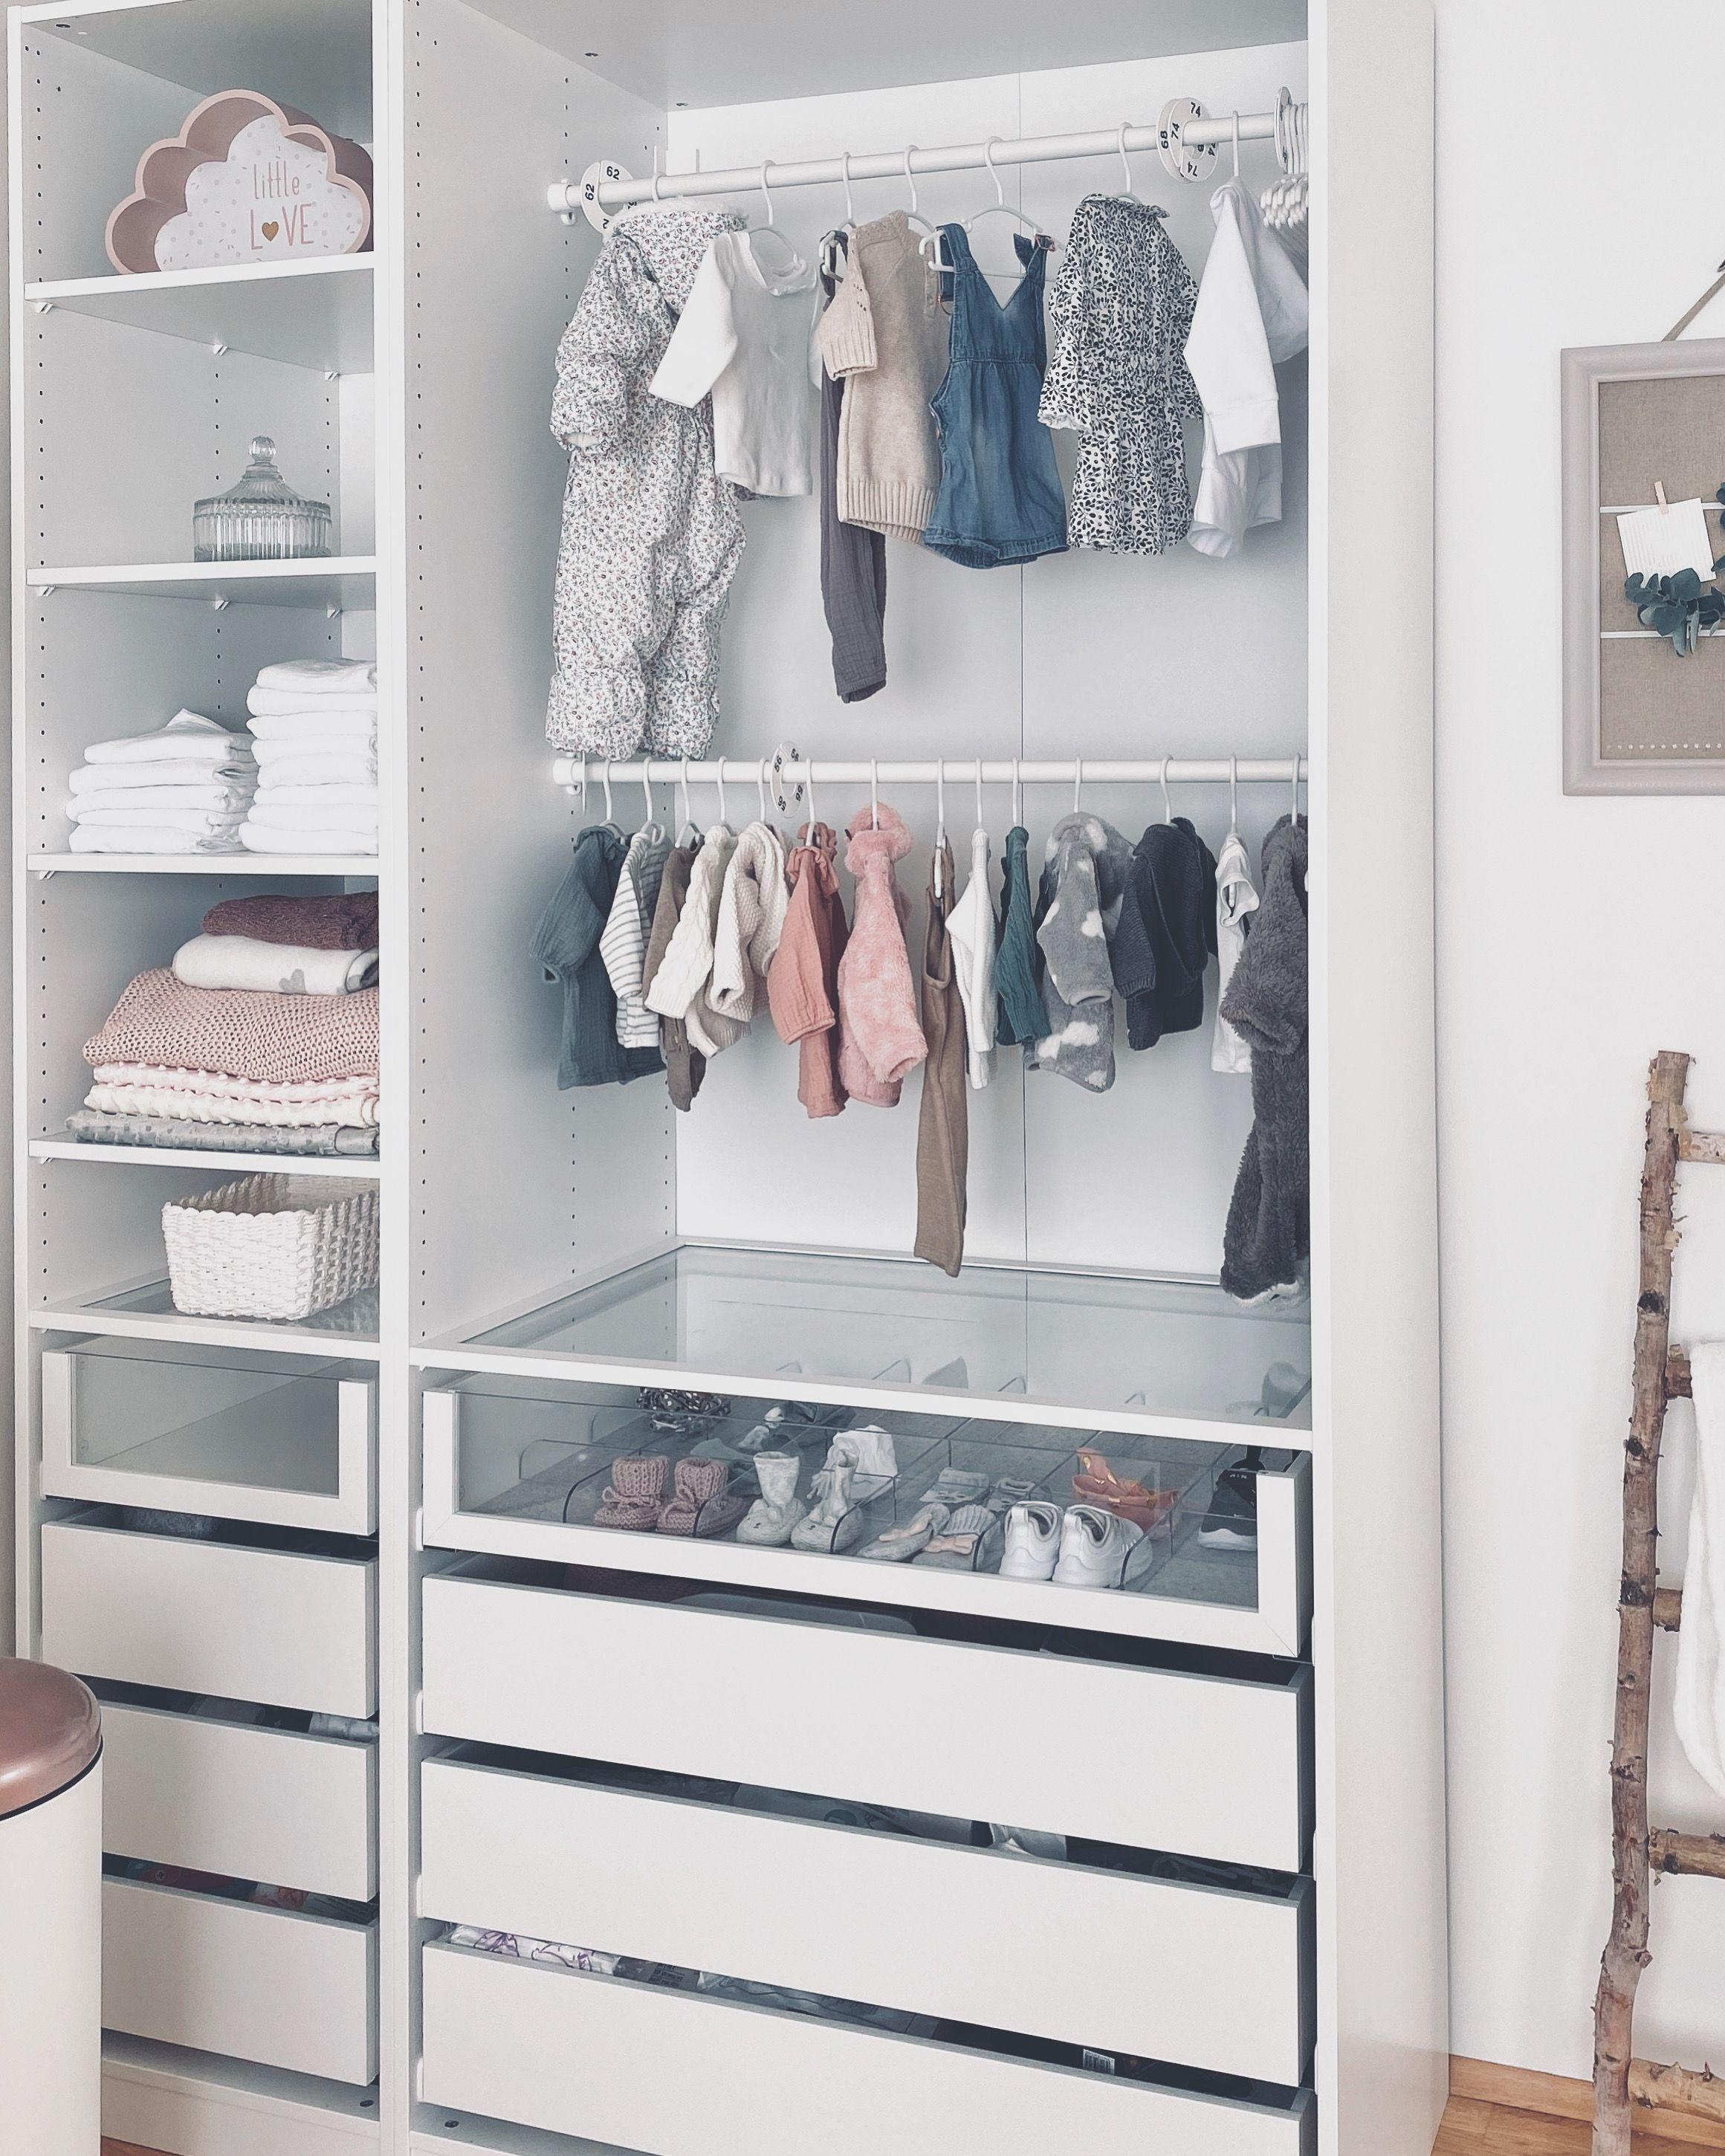 Ikea Pax Baby Kleiderschrank Wardrobe In 2020 Ikea Baby Baby